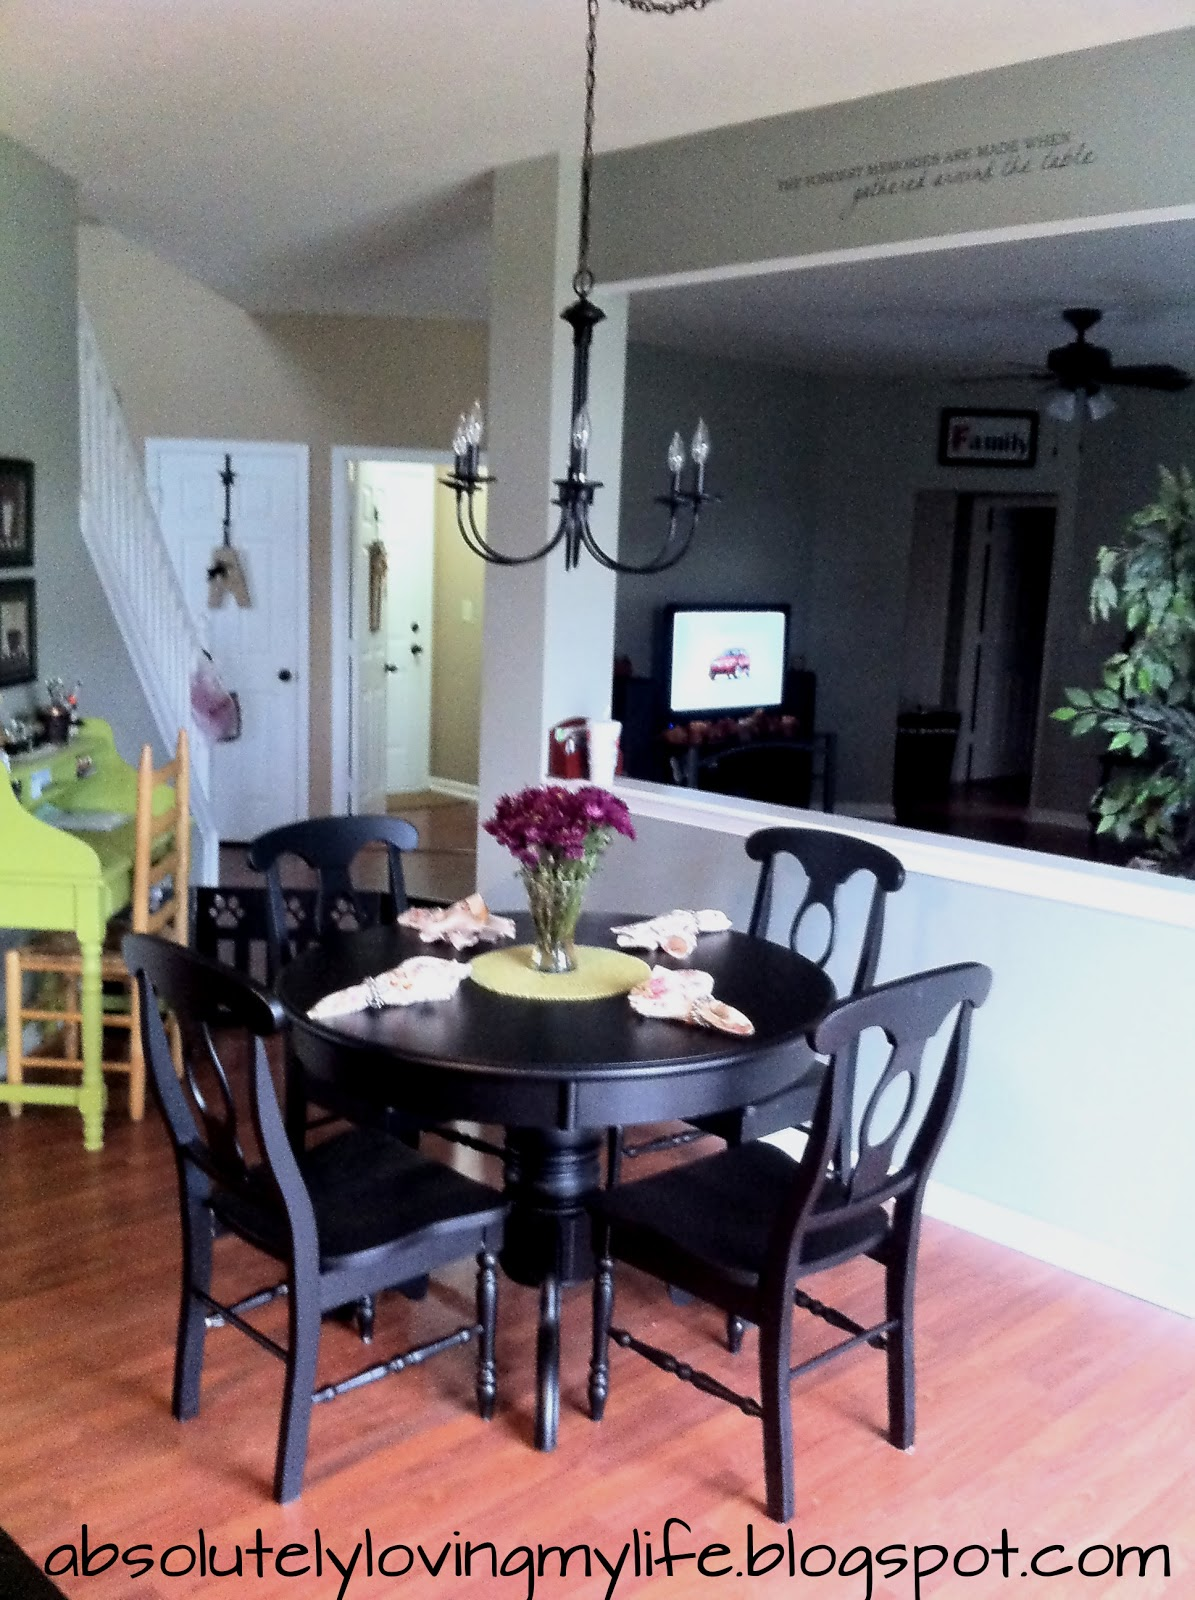 Loving Life Refinished Craigslist Kitchen Table  No